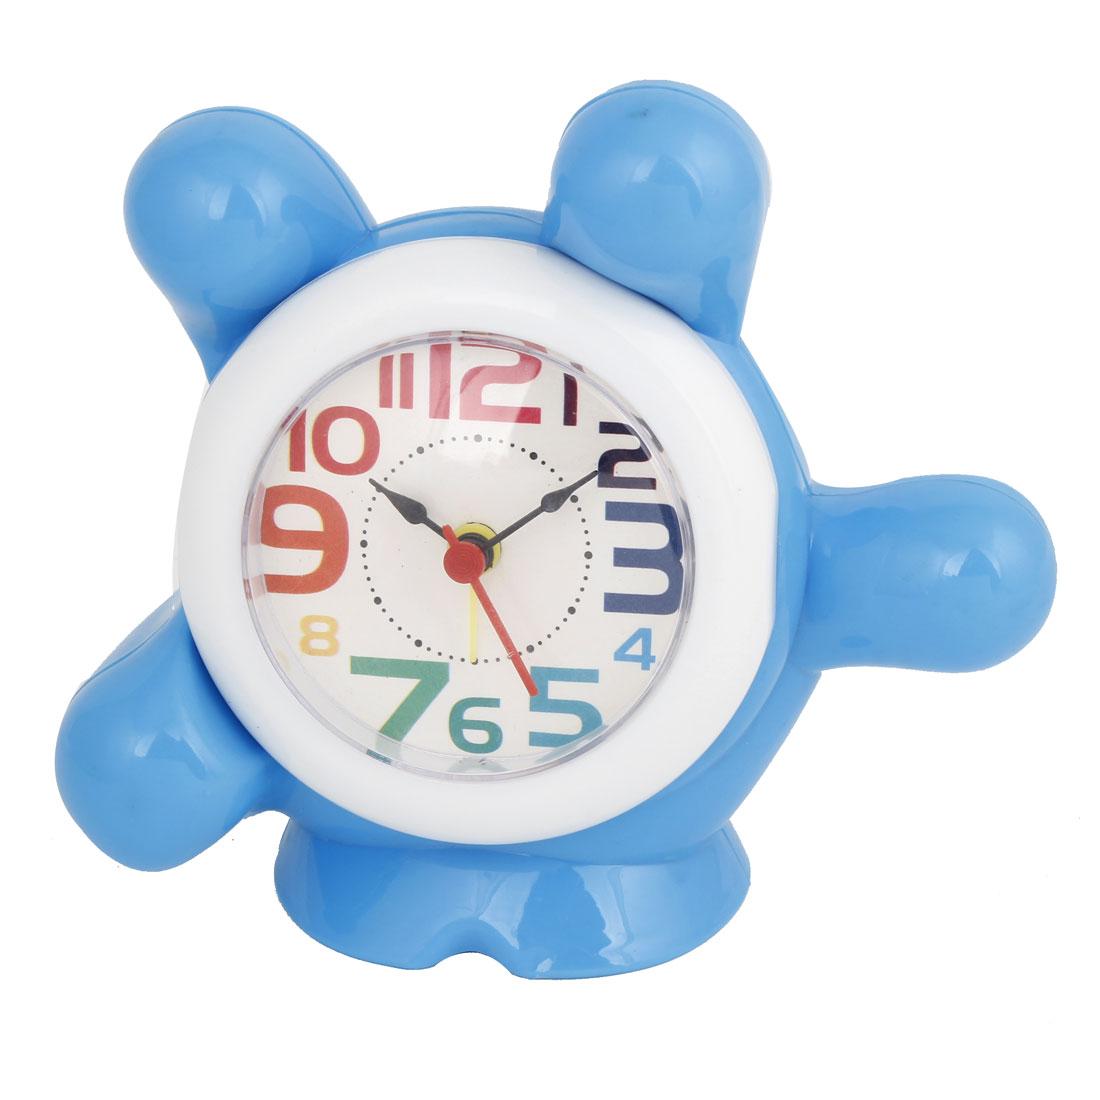 Blue Plastic Alarm Clock Palm Shaped Money Coin Saving Piggy Bank Box Holder